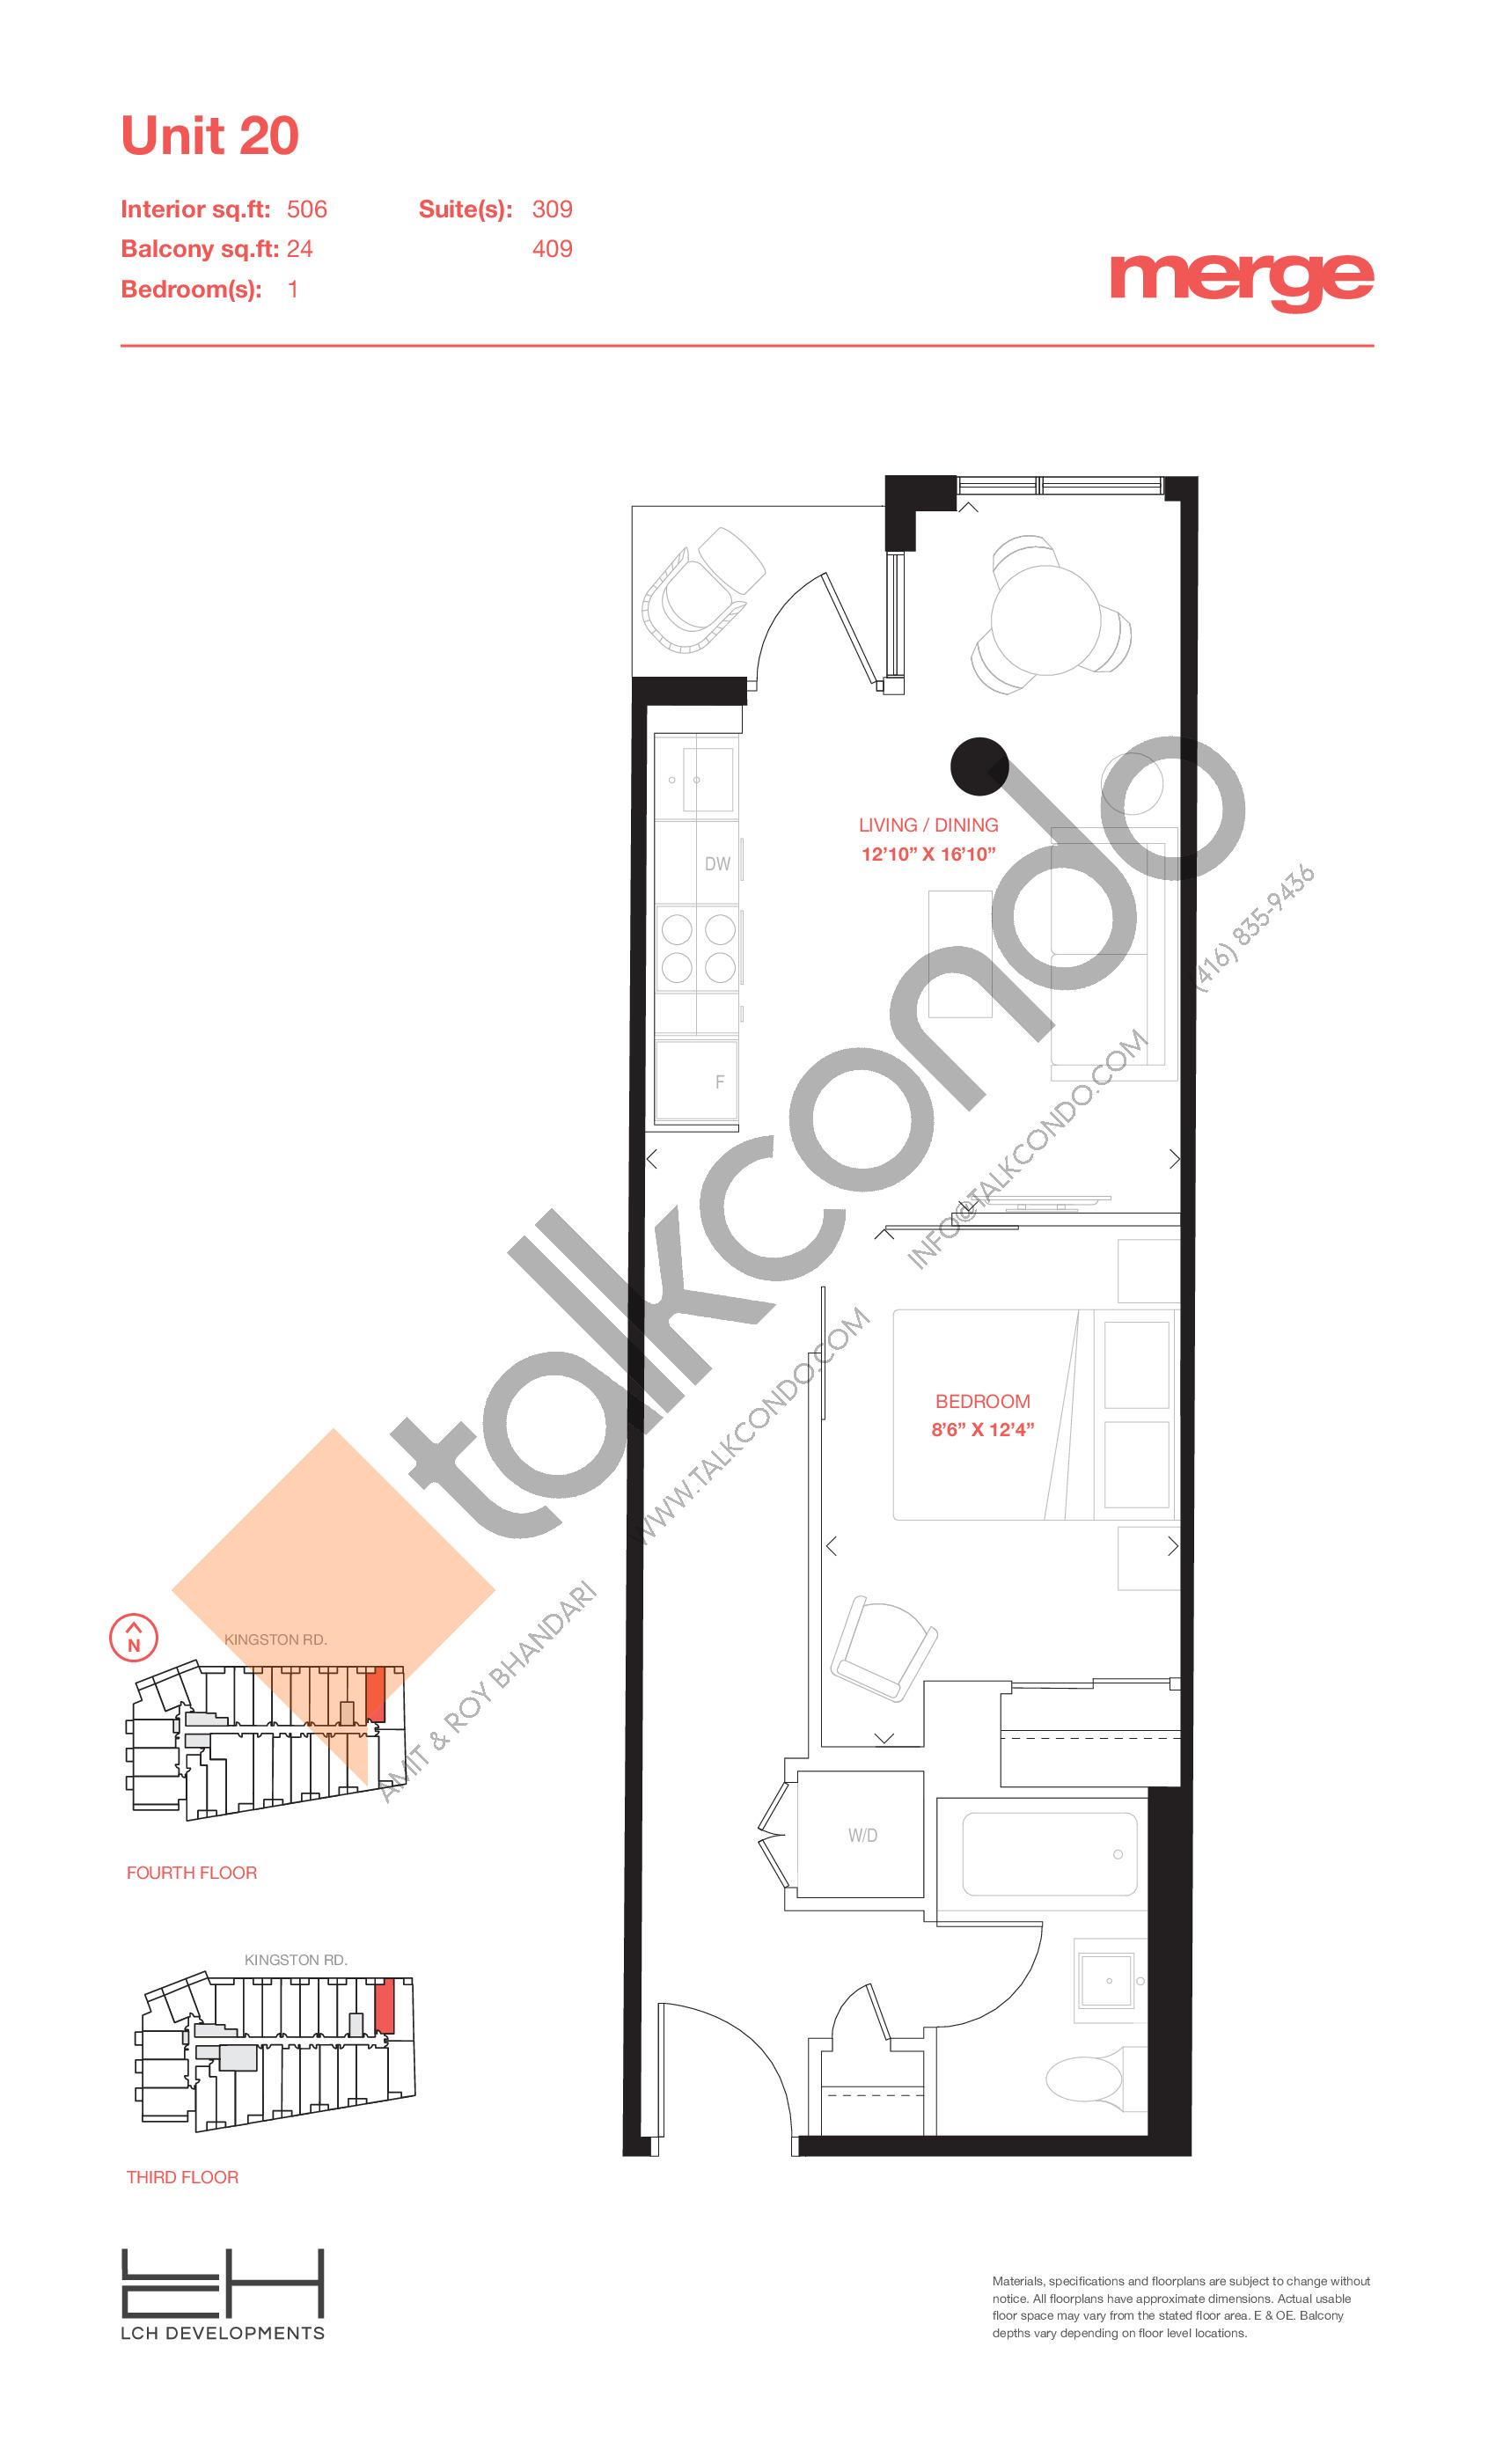 Unit 20 - Tower Floor Plan at Merge Condos - 506 sq.ft